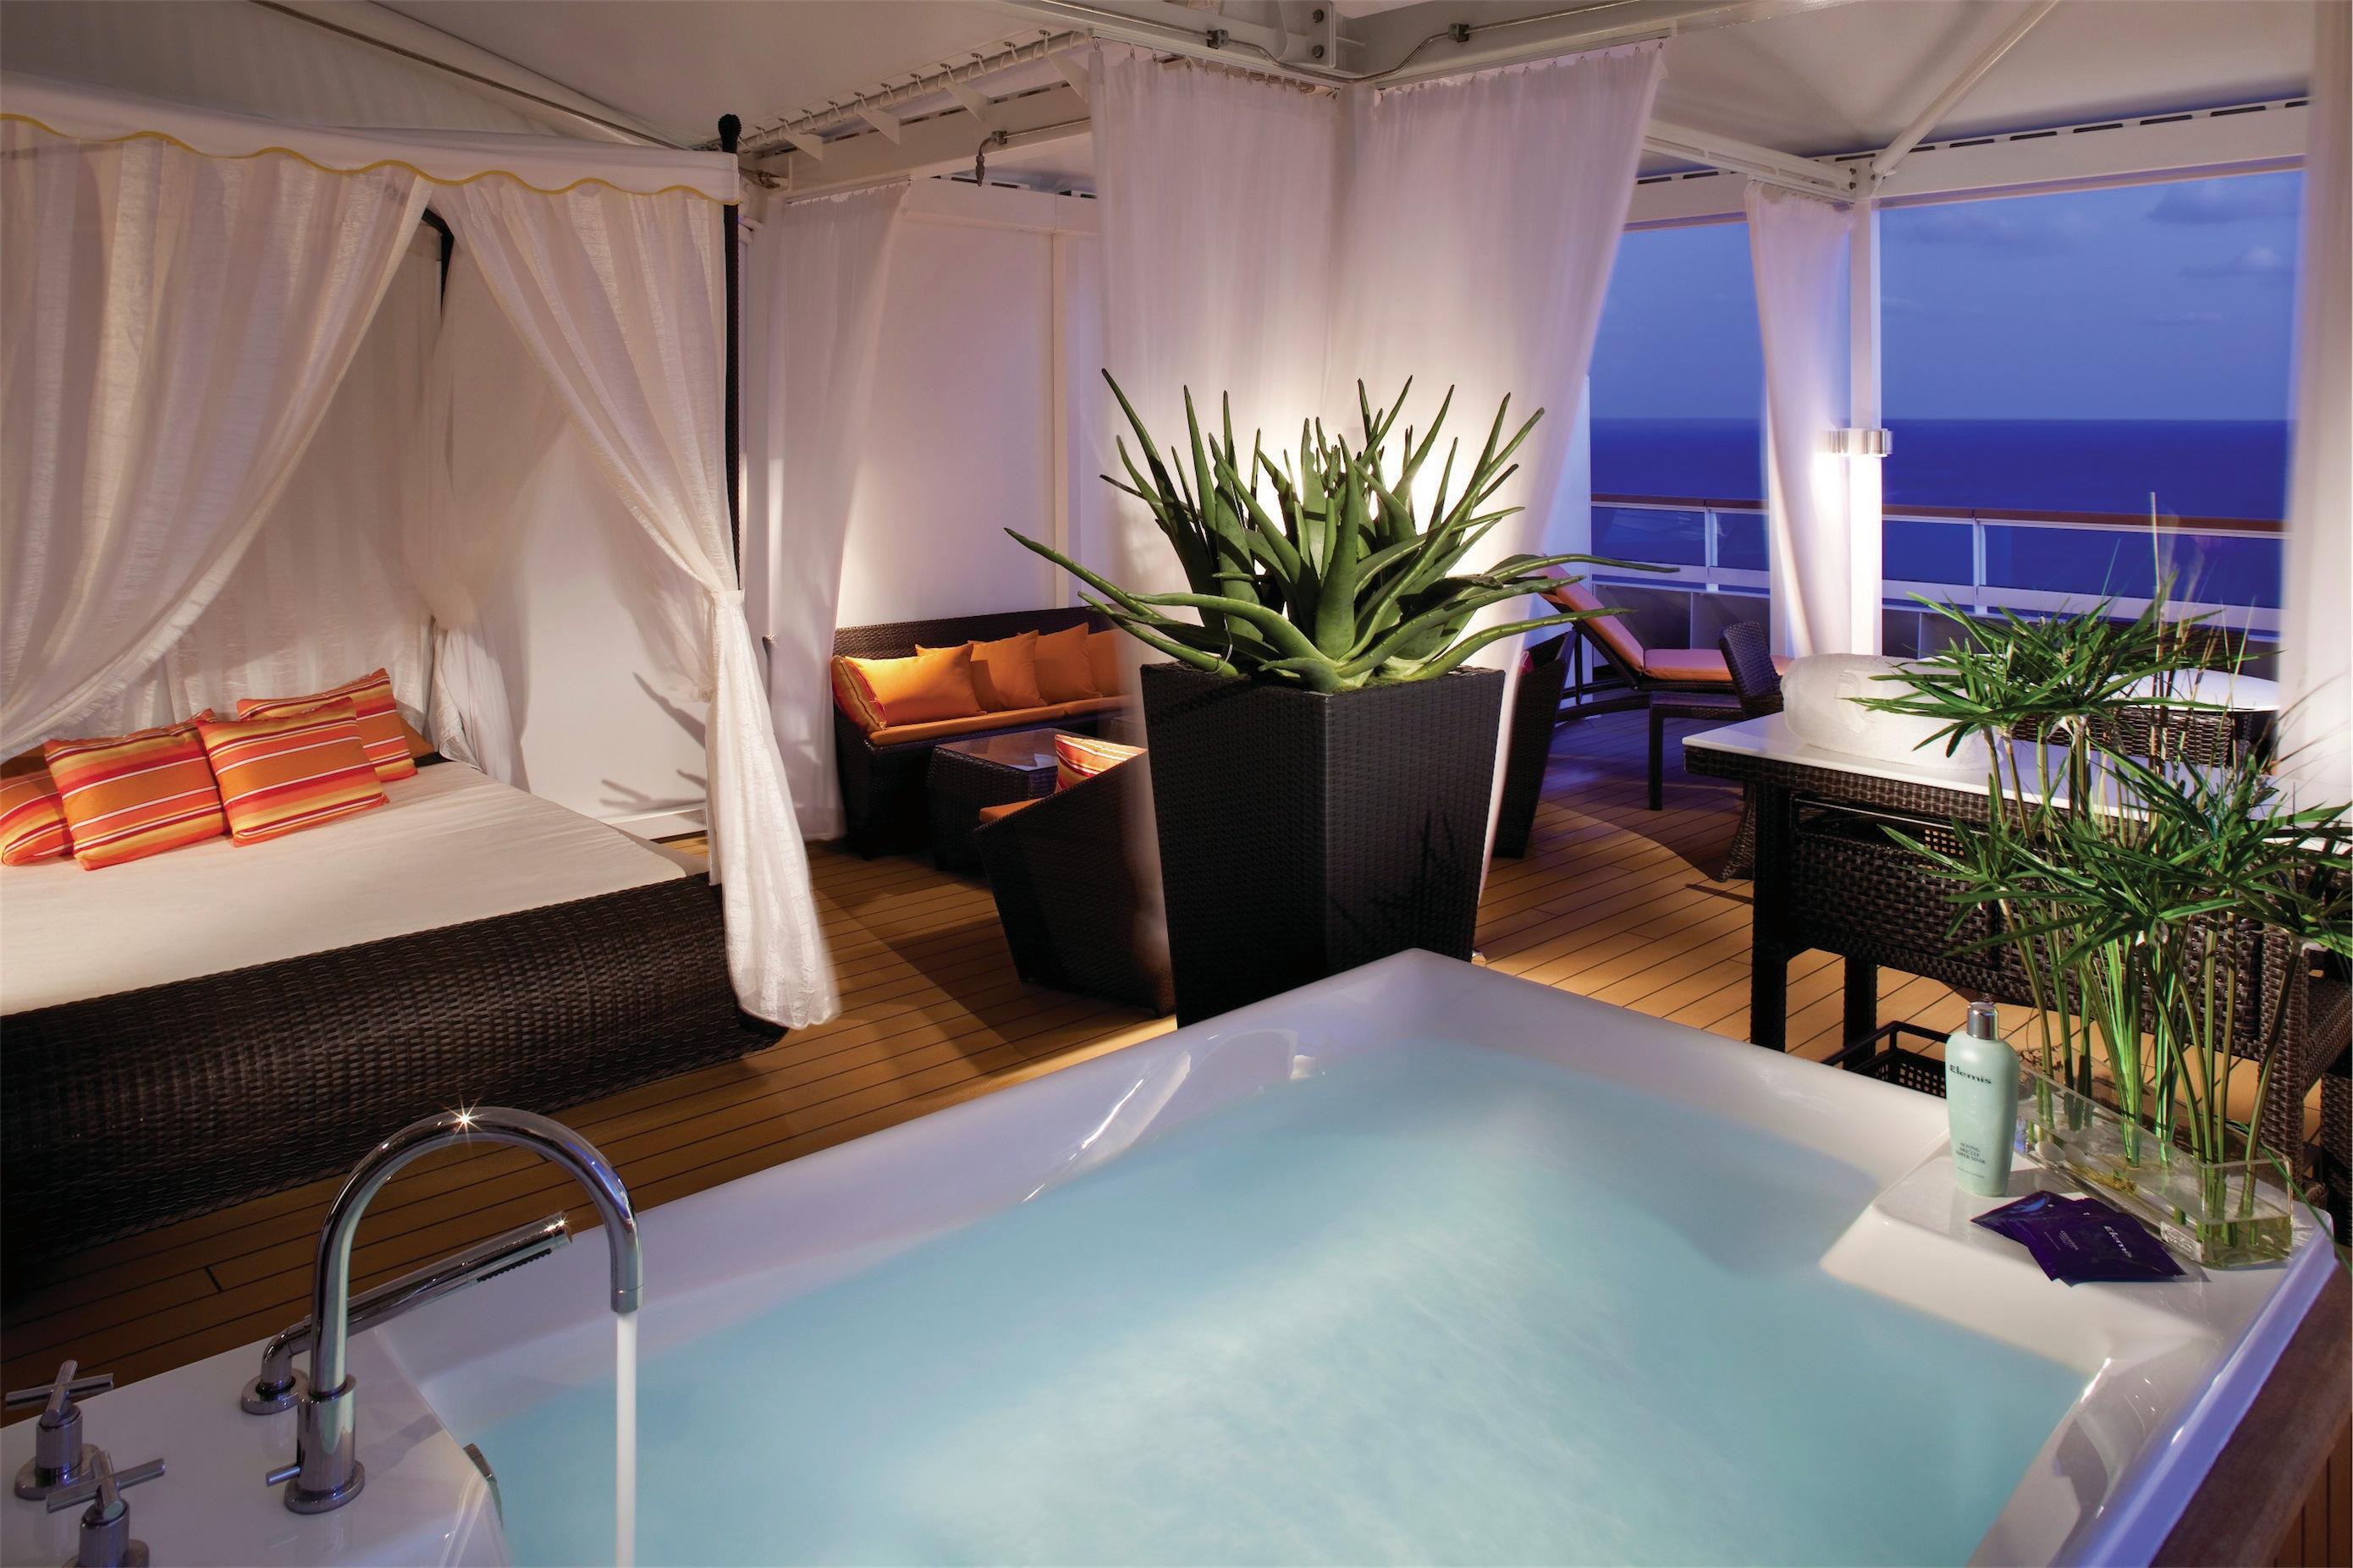 Seabourn Odyssey Class Interior Spa Villa.jpg